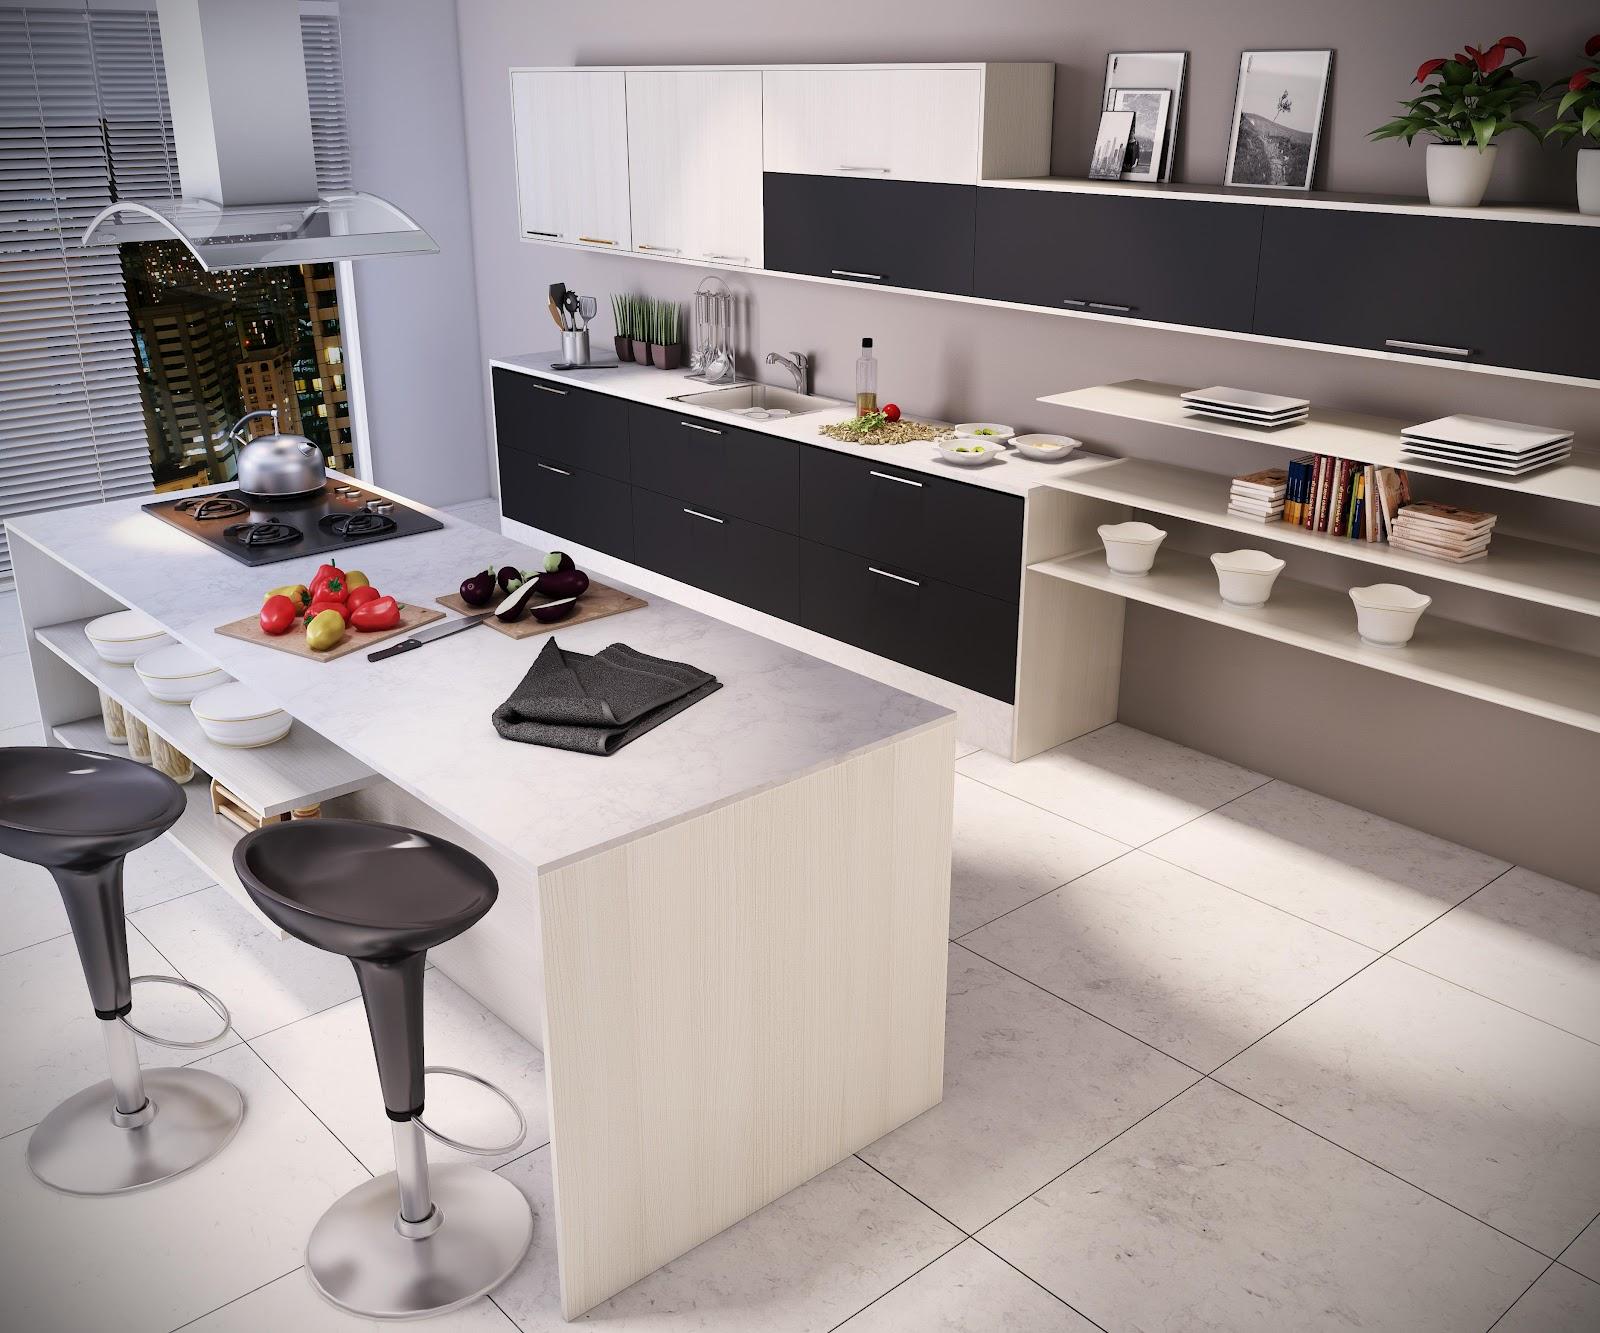 04/01/2012 05/01/2012 UP Design Inteligente #705D4C 1600 1333